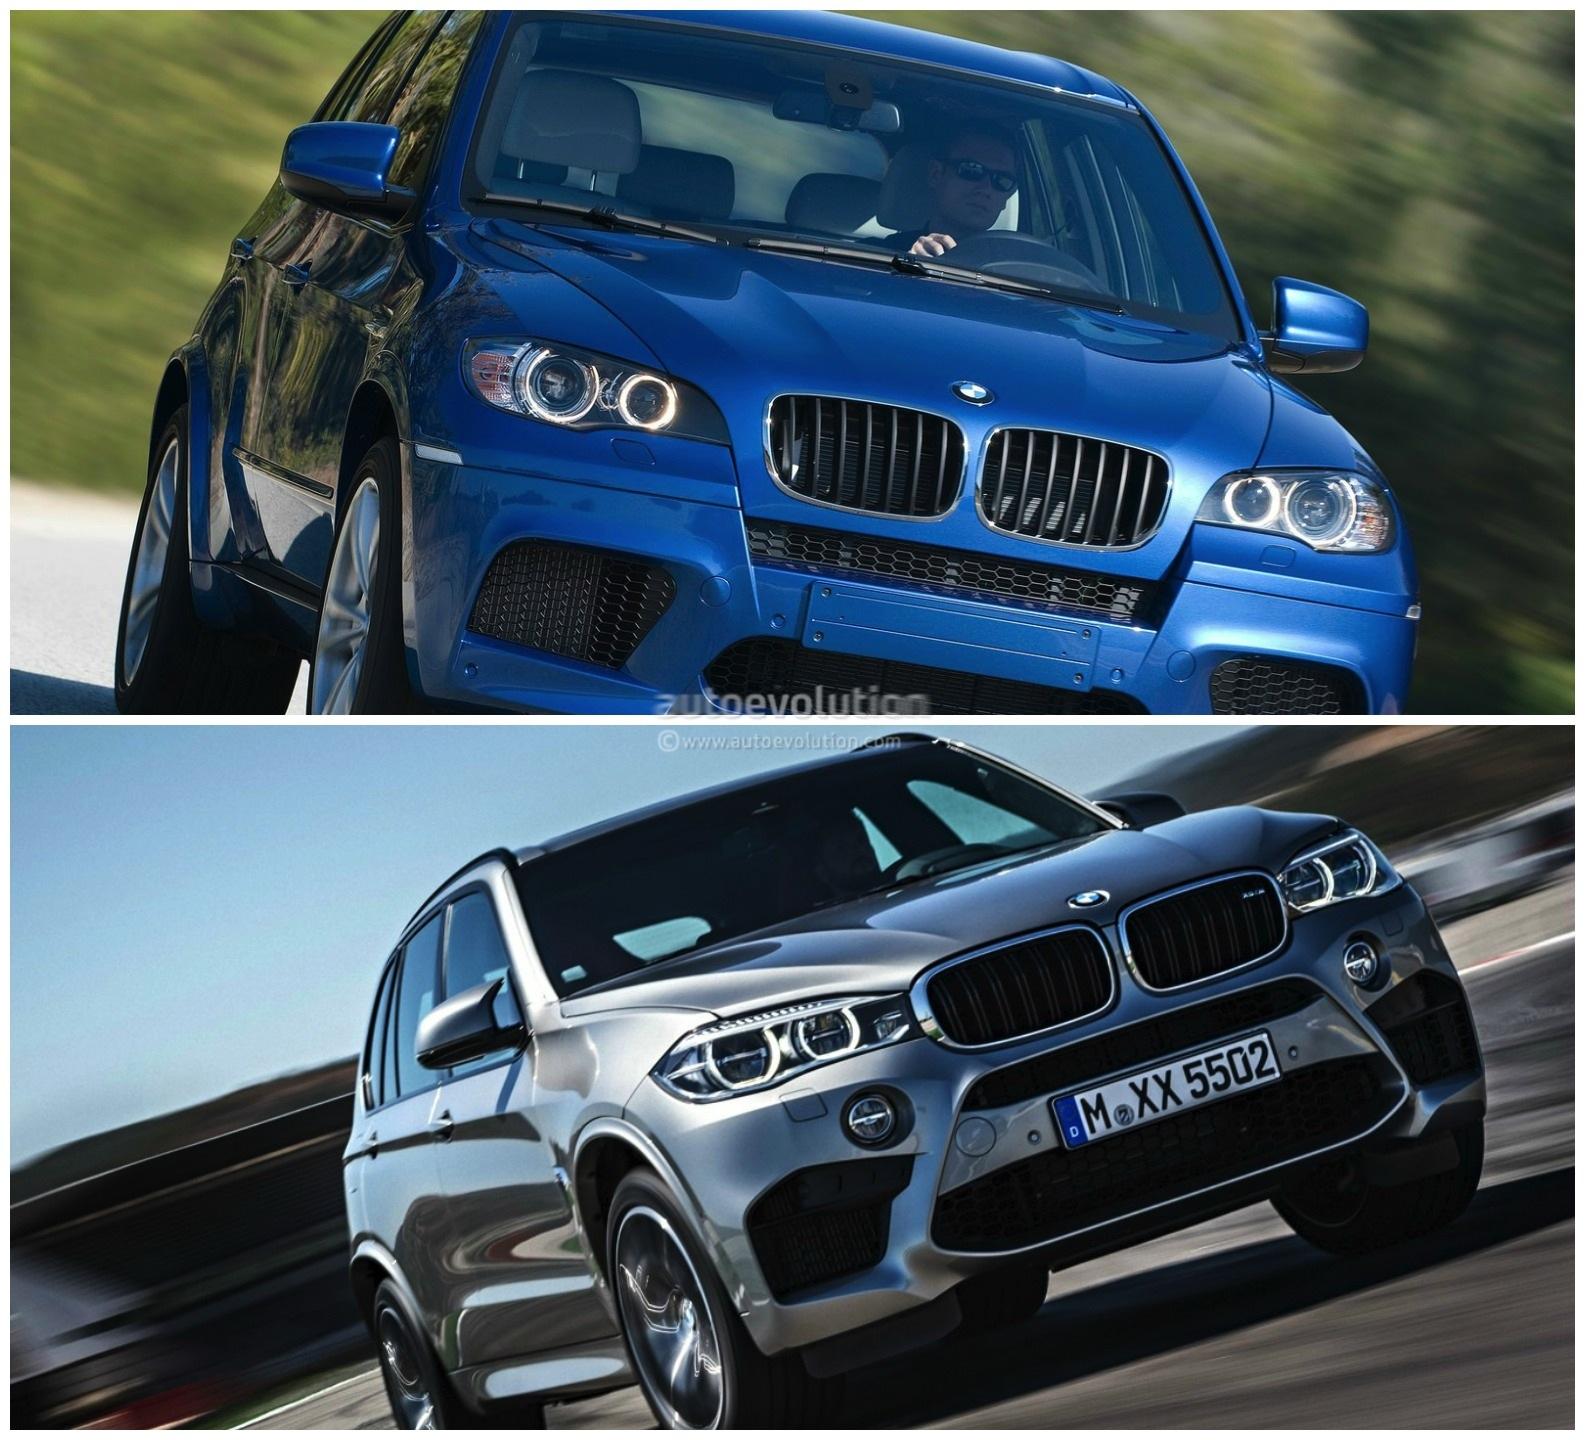 Photo Comparison: 2015 BMW X5 M Vs The Original